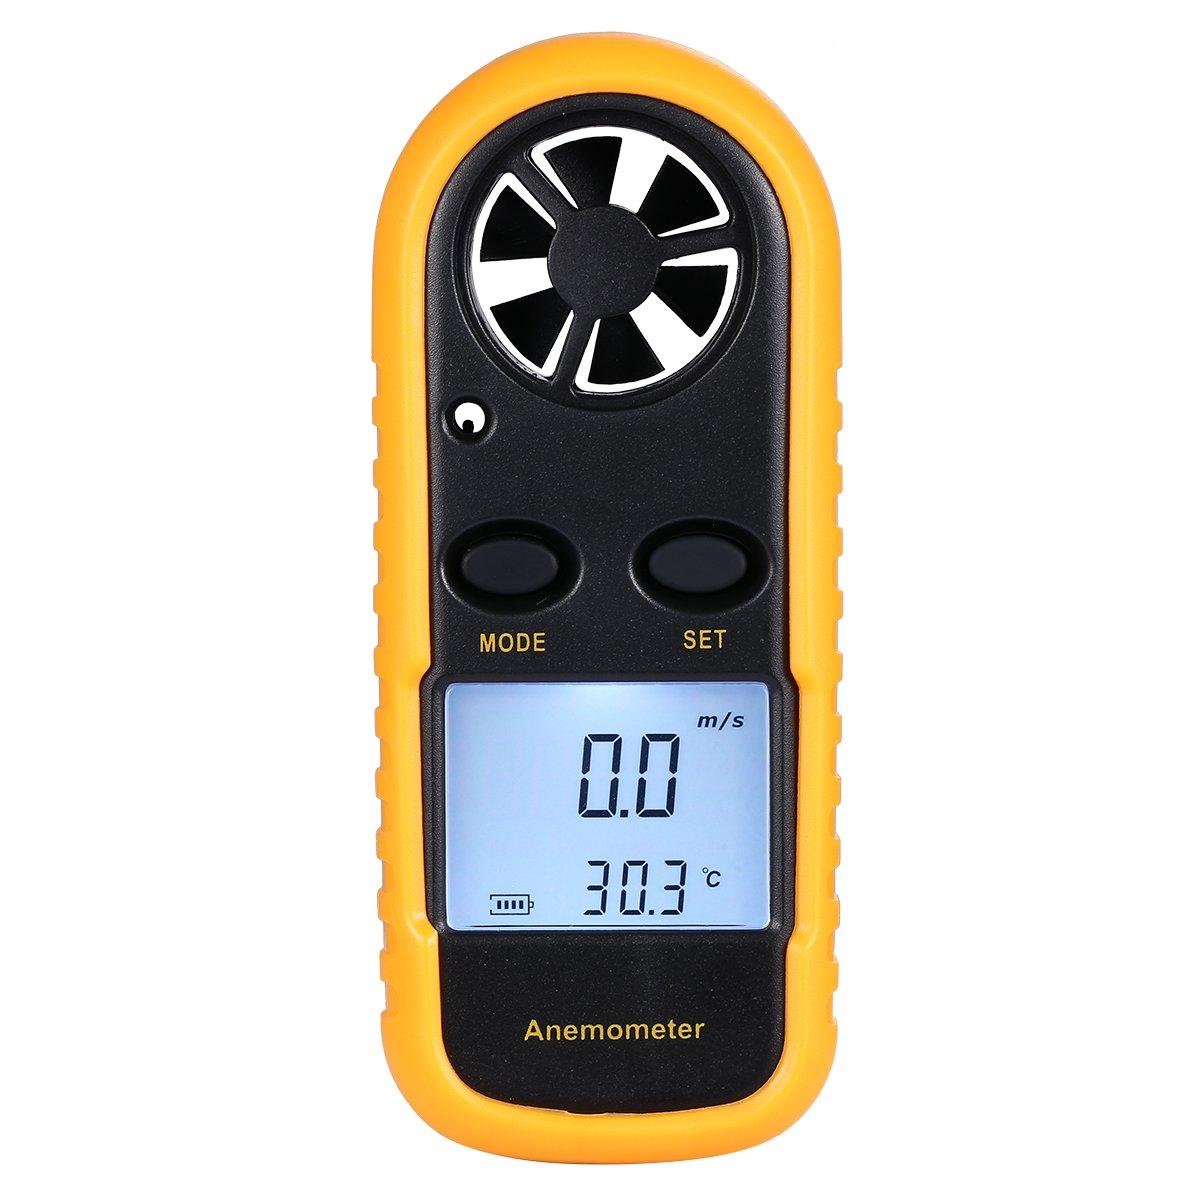 Mseng handheld anemometer miniature digital lcd wind speed measuring instrument digital thermistor air speed measurement of wind and air in sailing boat etc